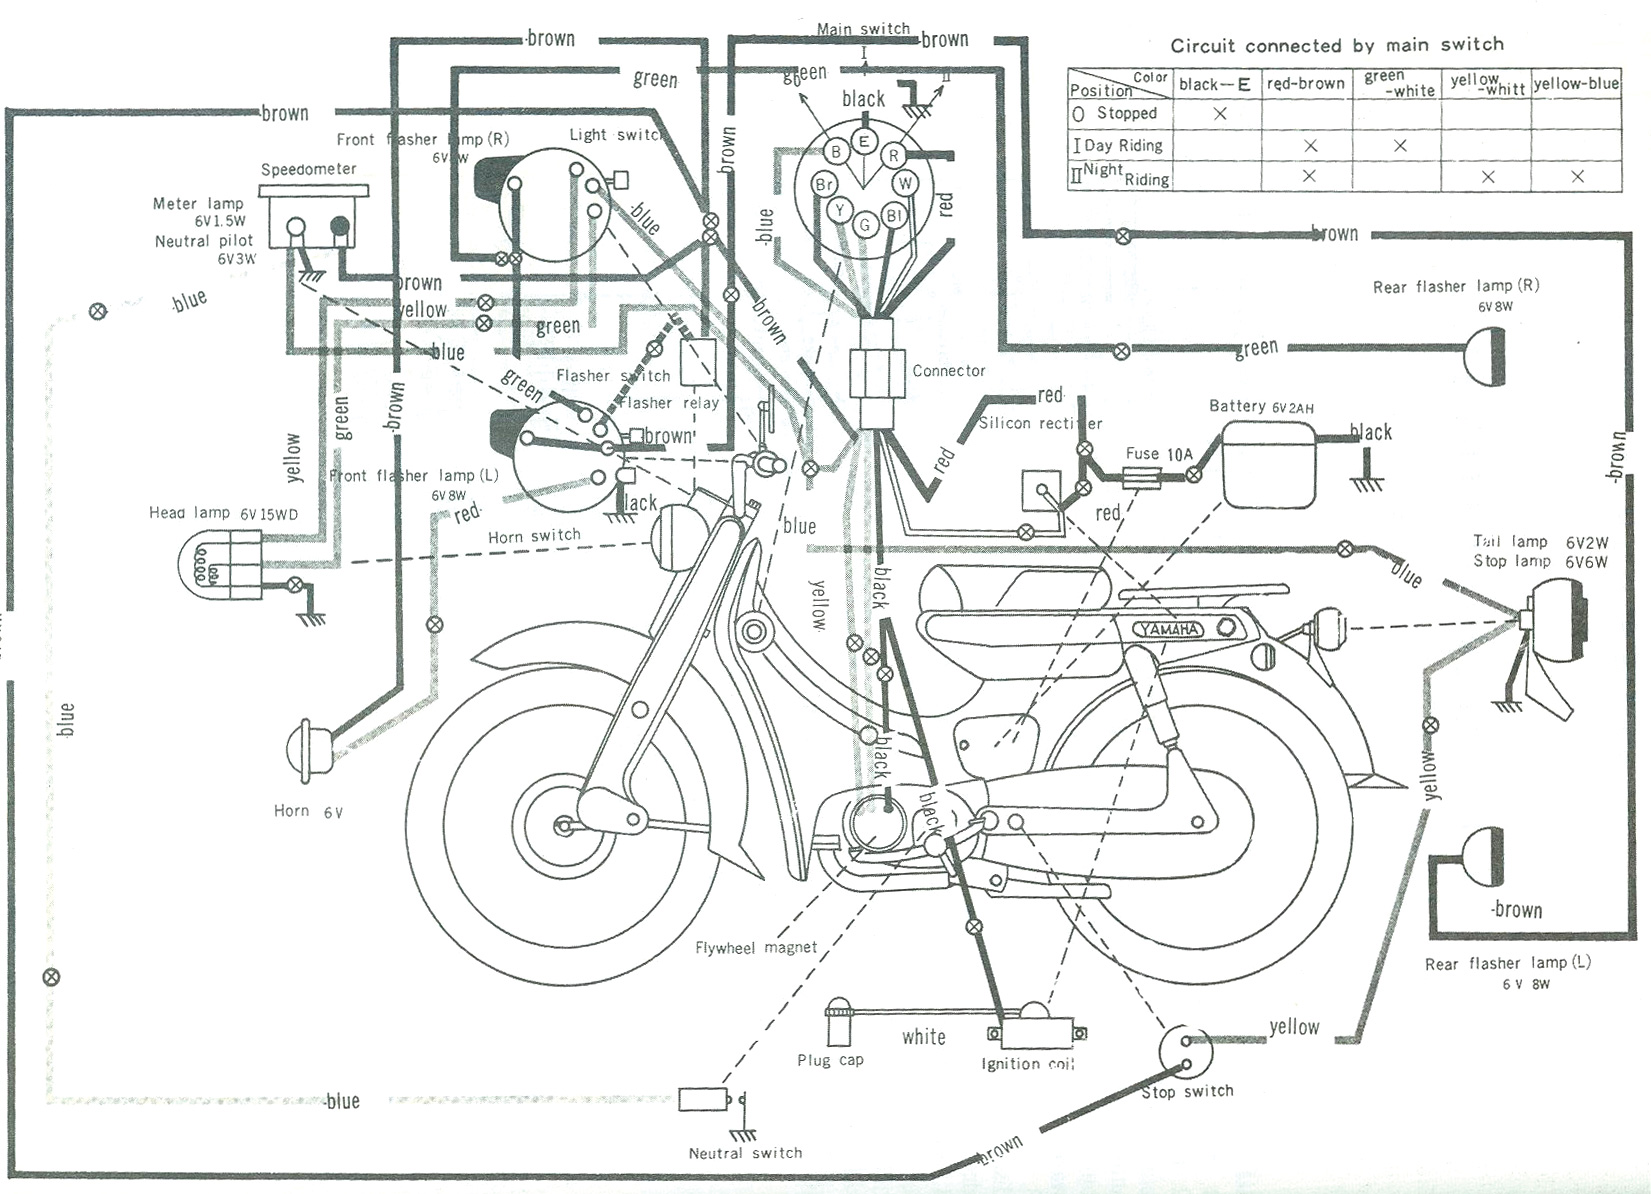 Sensational Yamaha Enduro Wiring Diagram Diagram Data Schema Wiring Digital Resources Antuskbiperorg